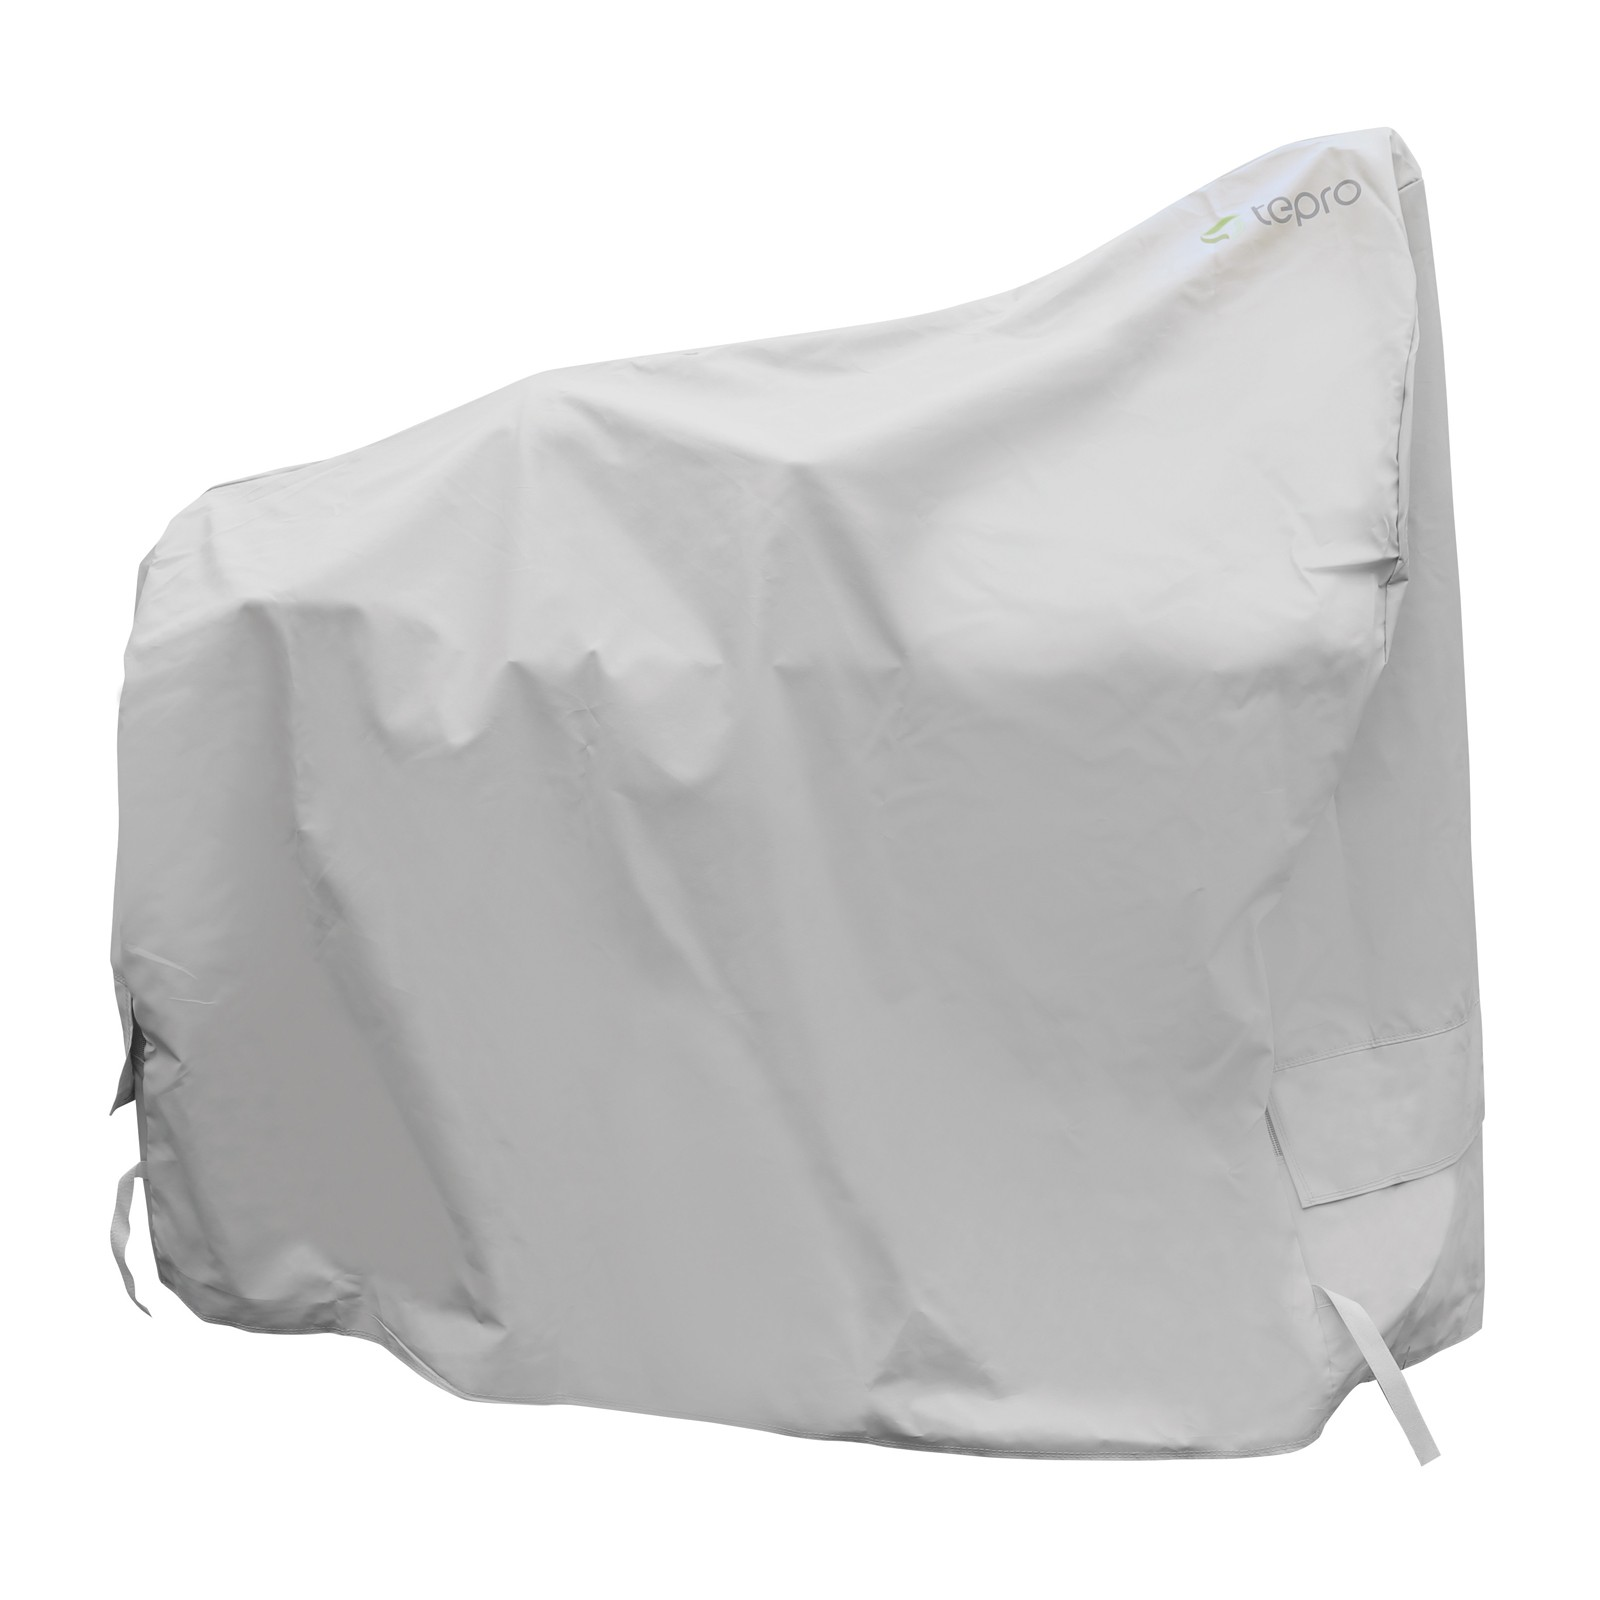 tepro universal abdeckhaube f r smoker polyester. Black Bedroom Furniture Sets. Home Design Ideas